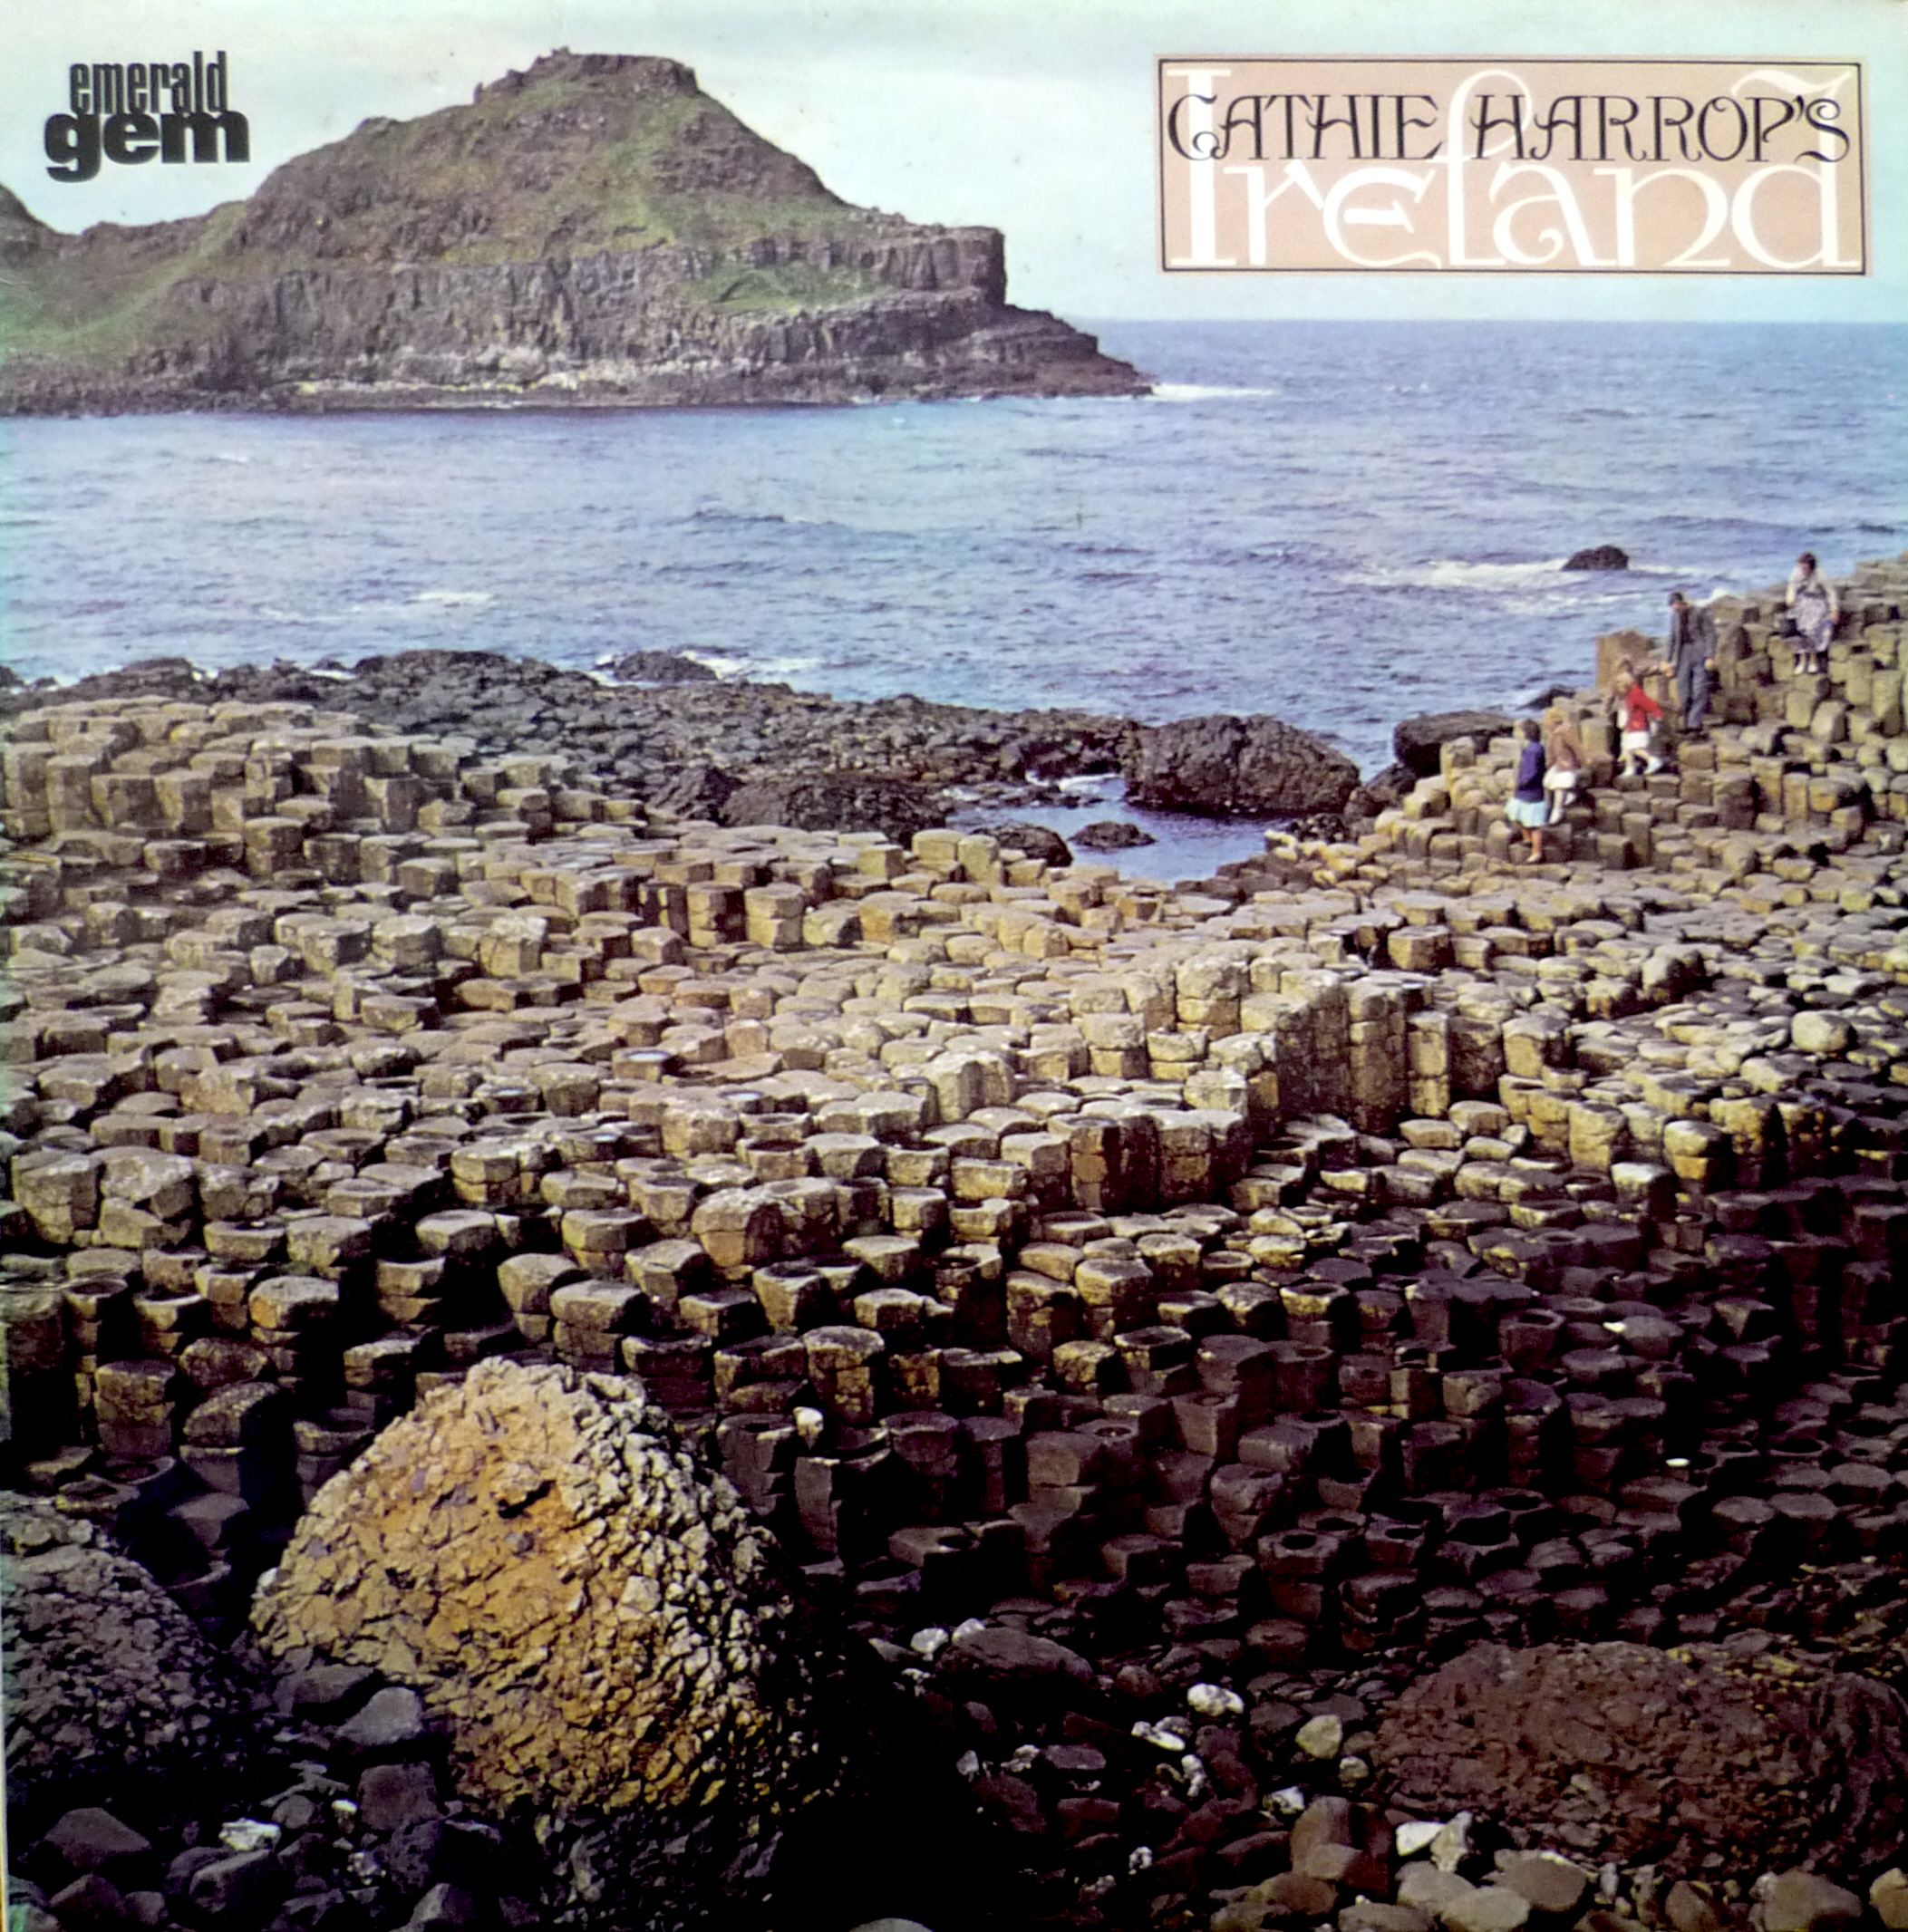 Cathie Harrop - I like Life